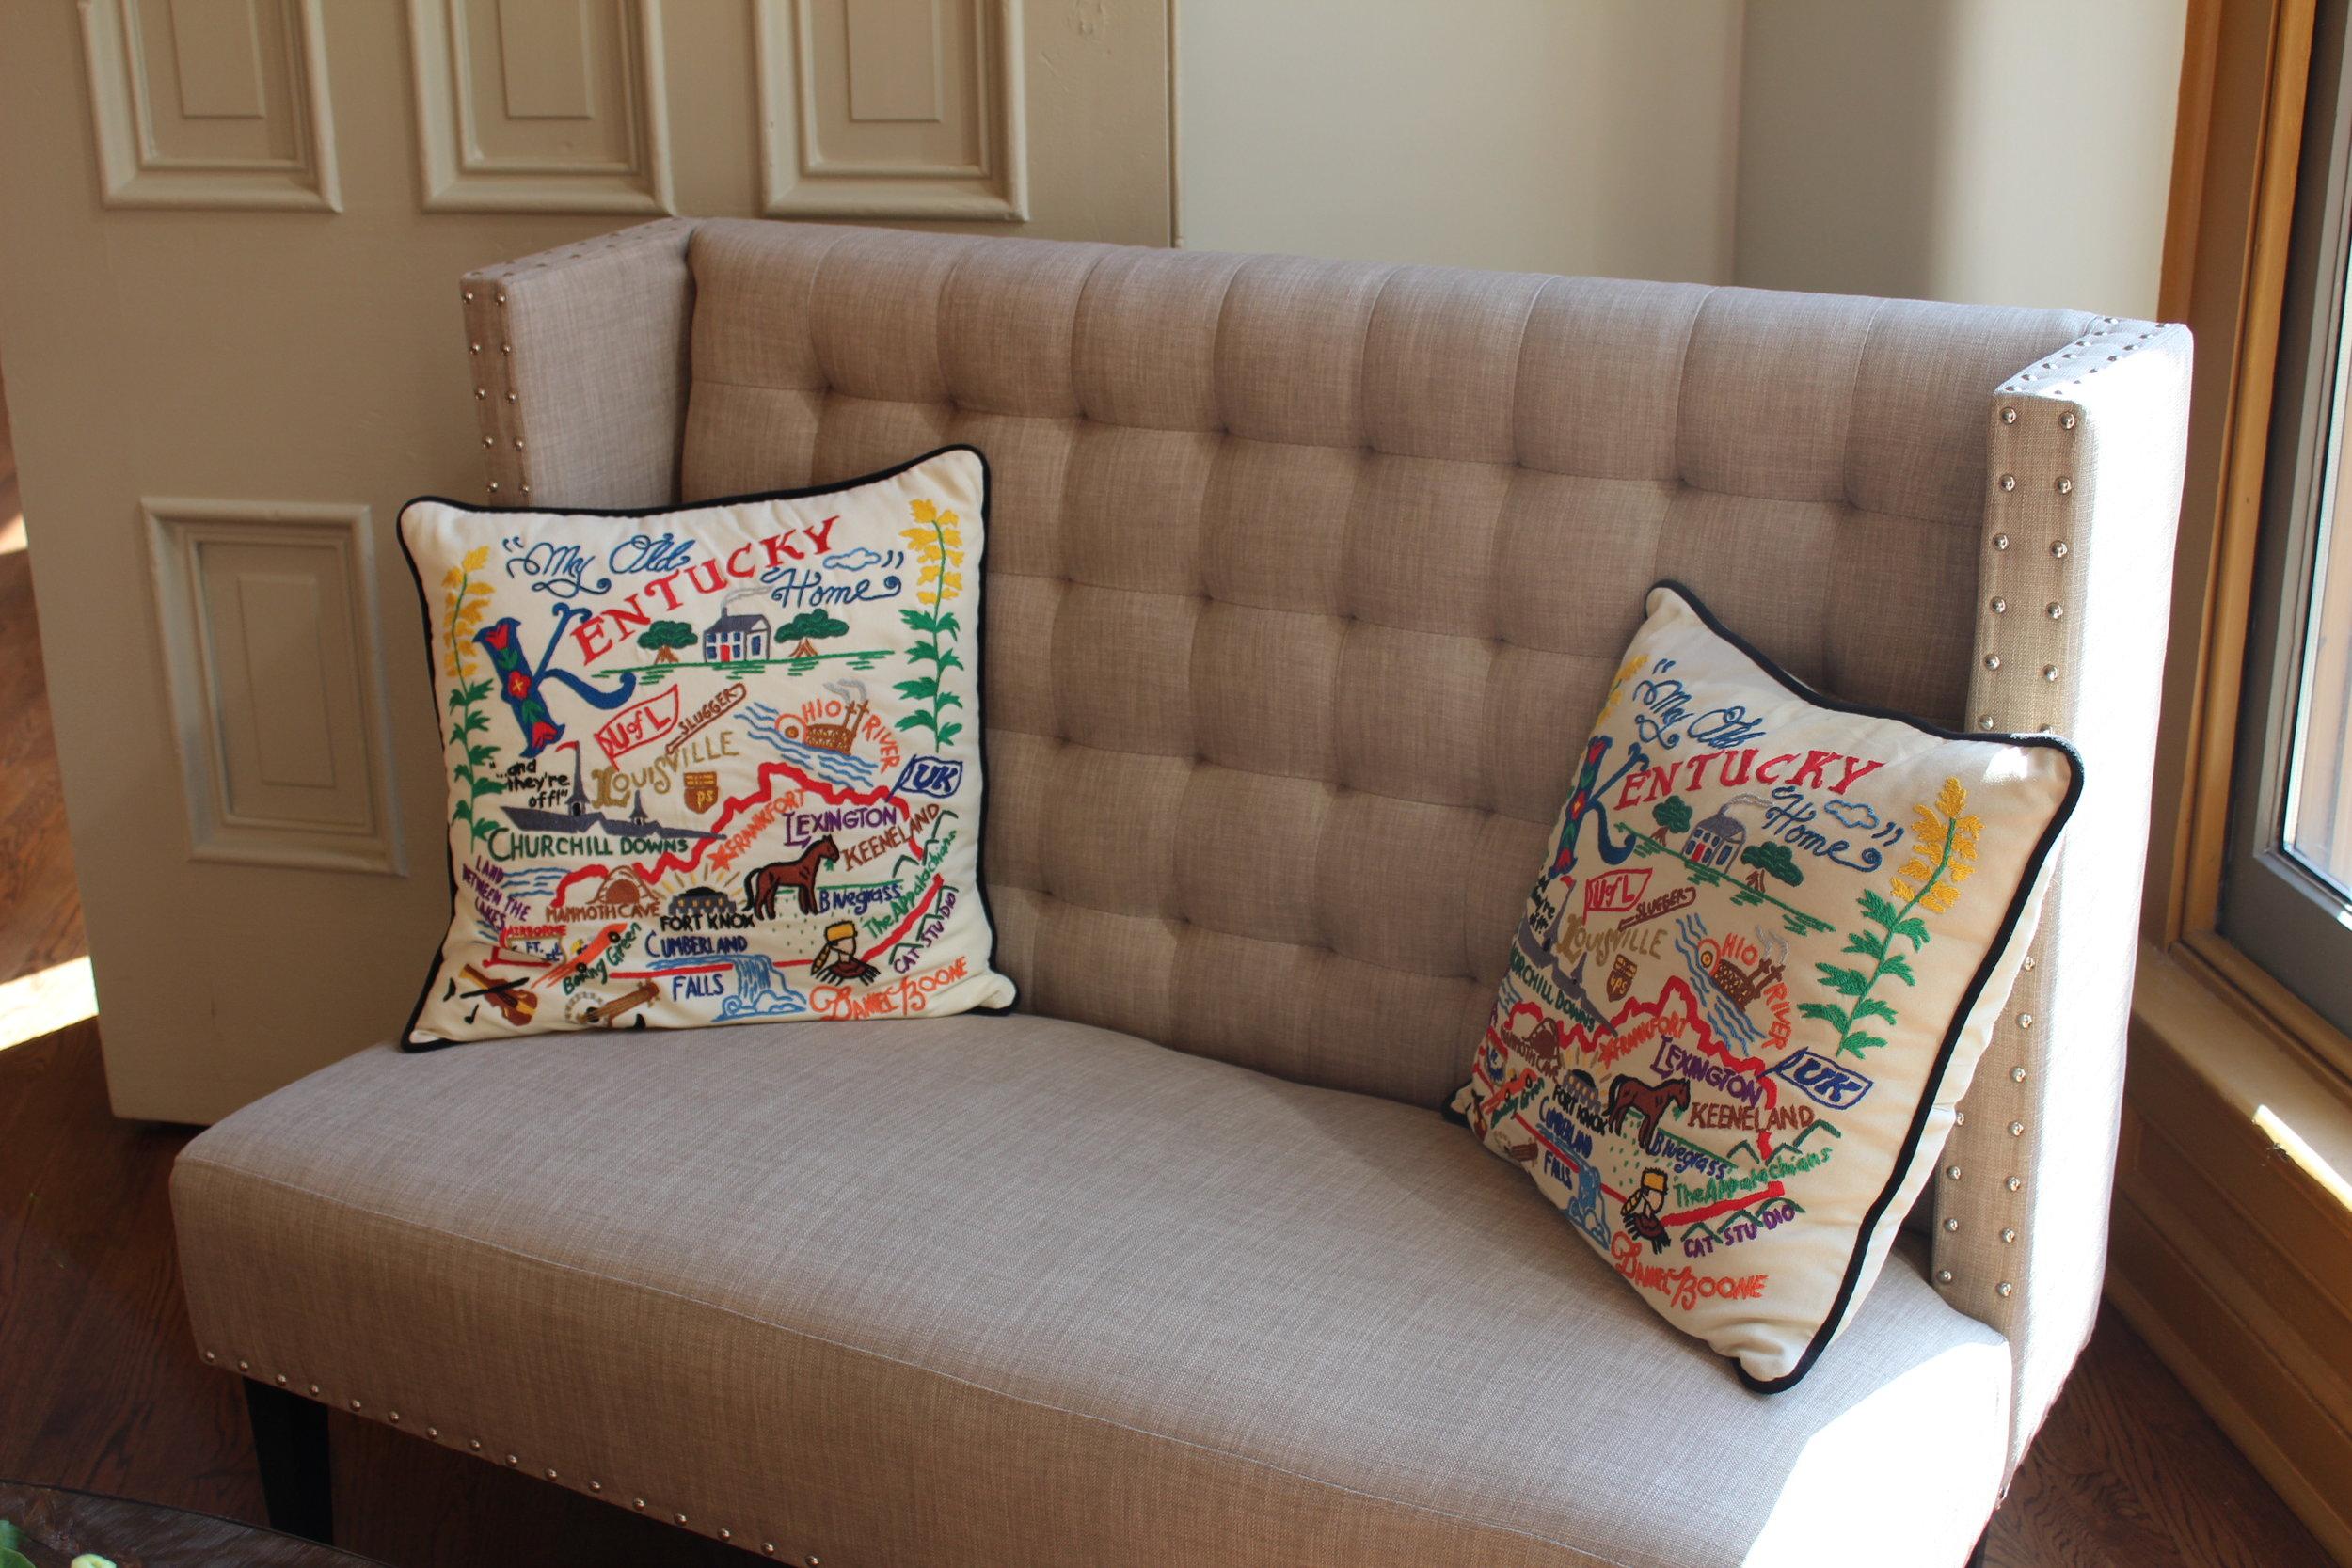 Couples Settee with Kentucky Pillows 2.jpg